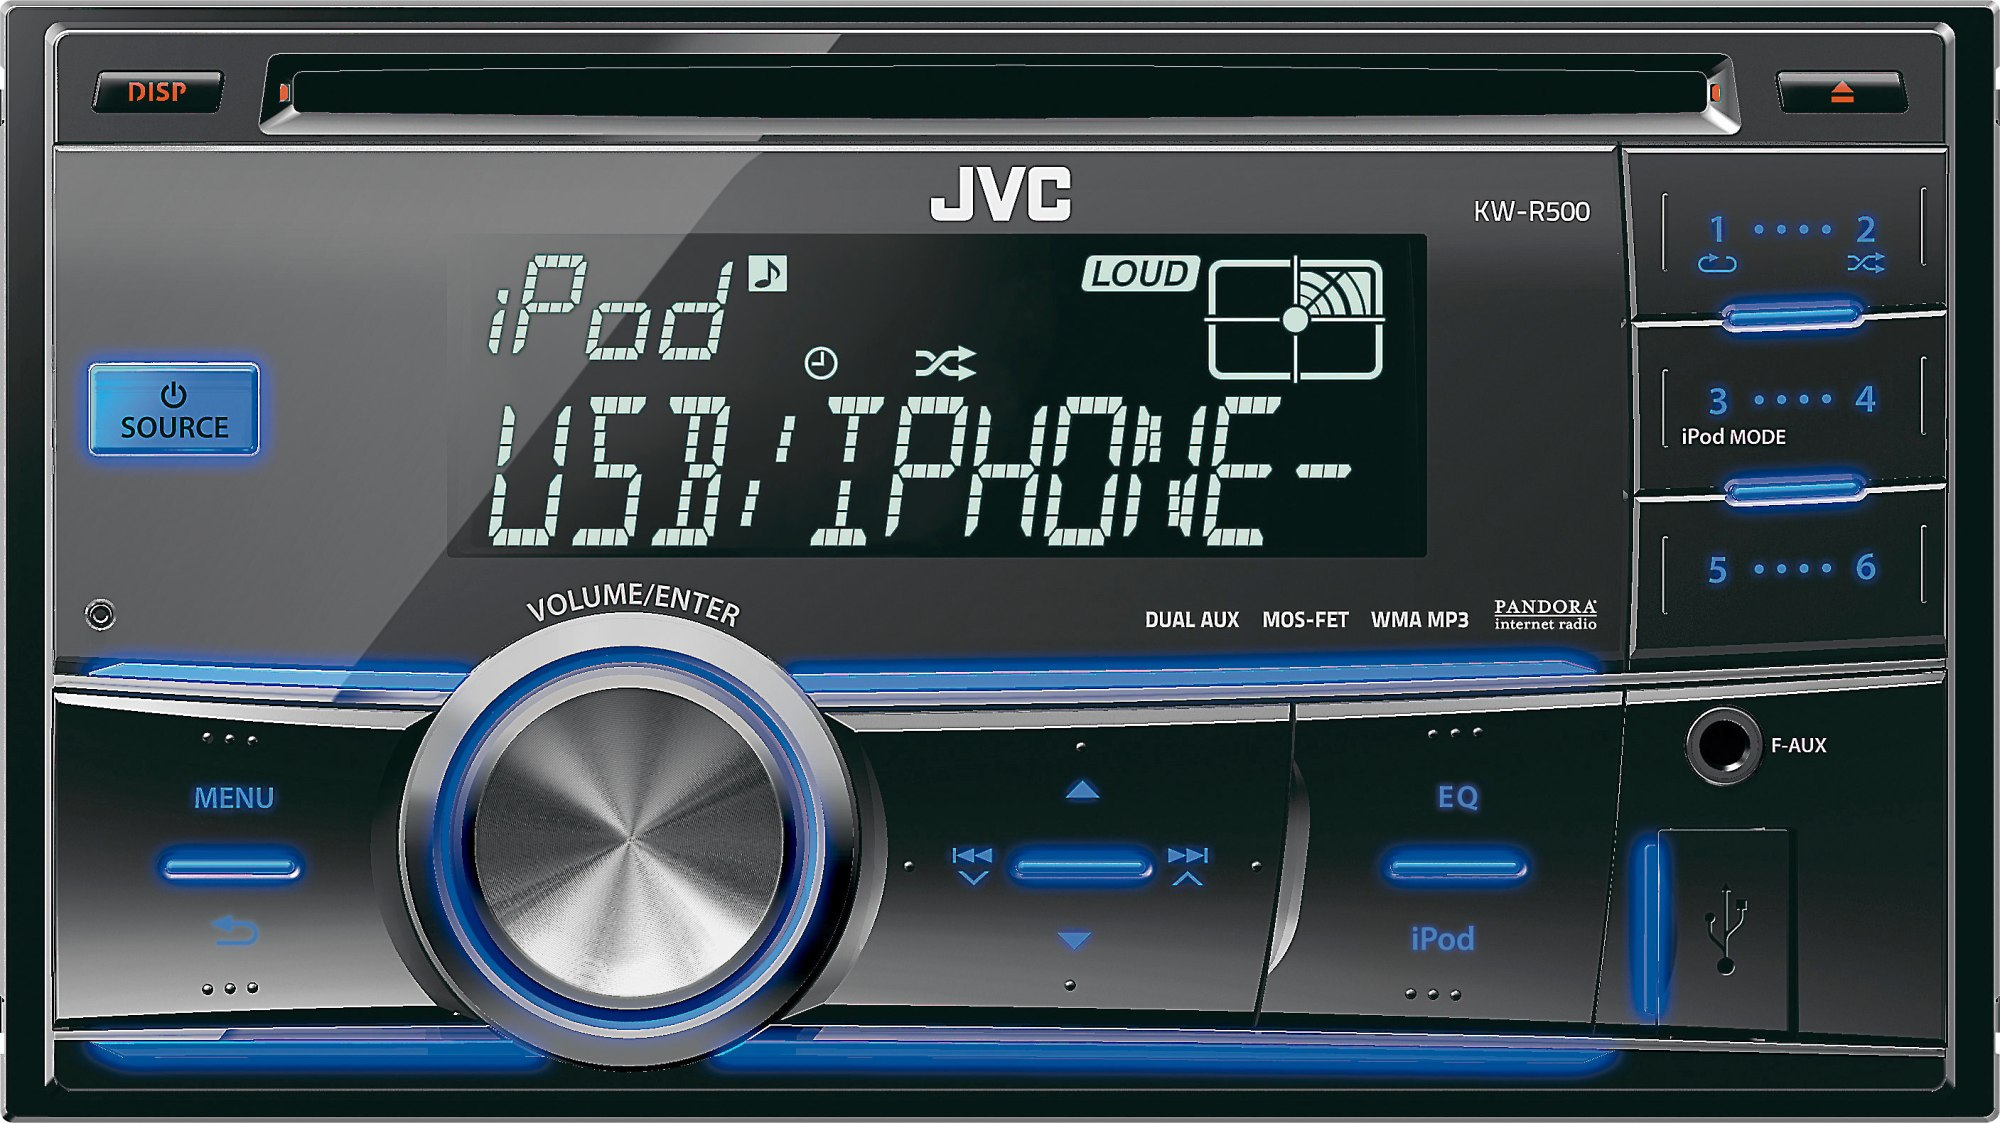 hight resolution of jvc kw r500 car stereo wiring diagram wiring schematic diagram jvc car audio wiring diagram kd g342